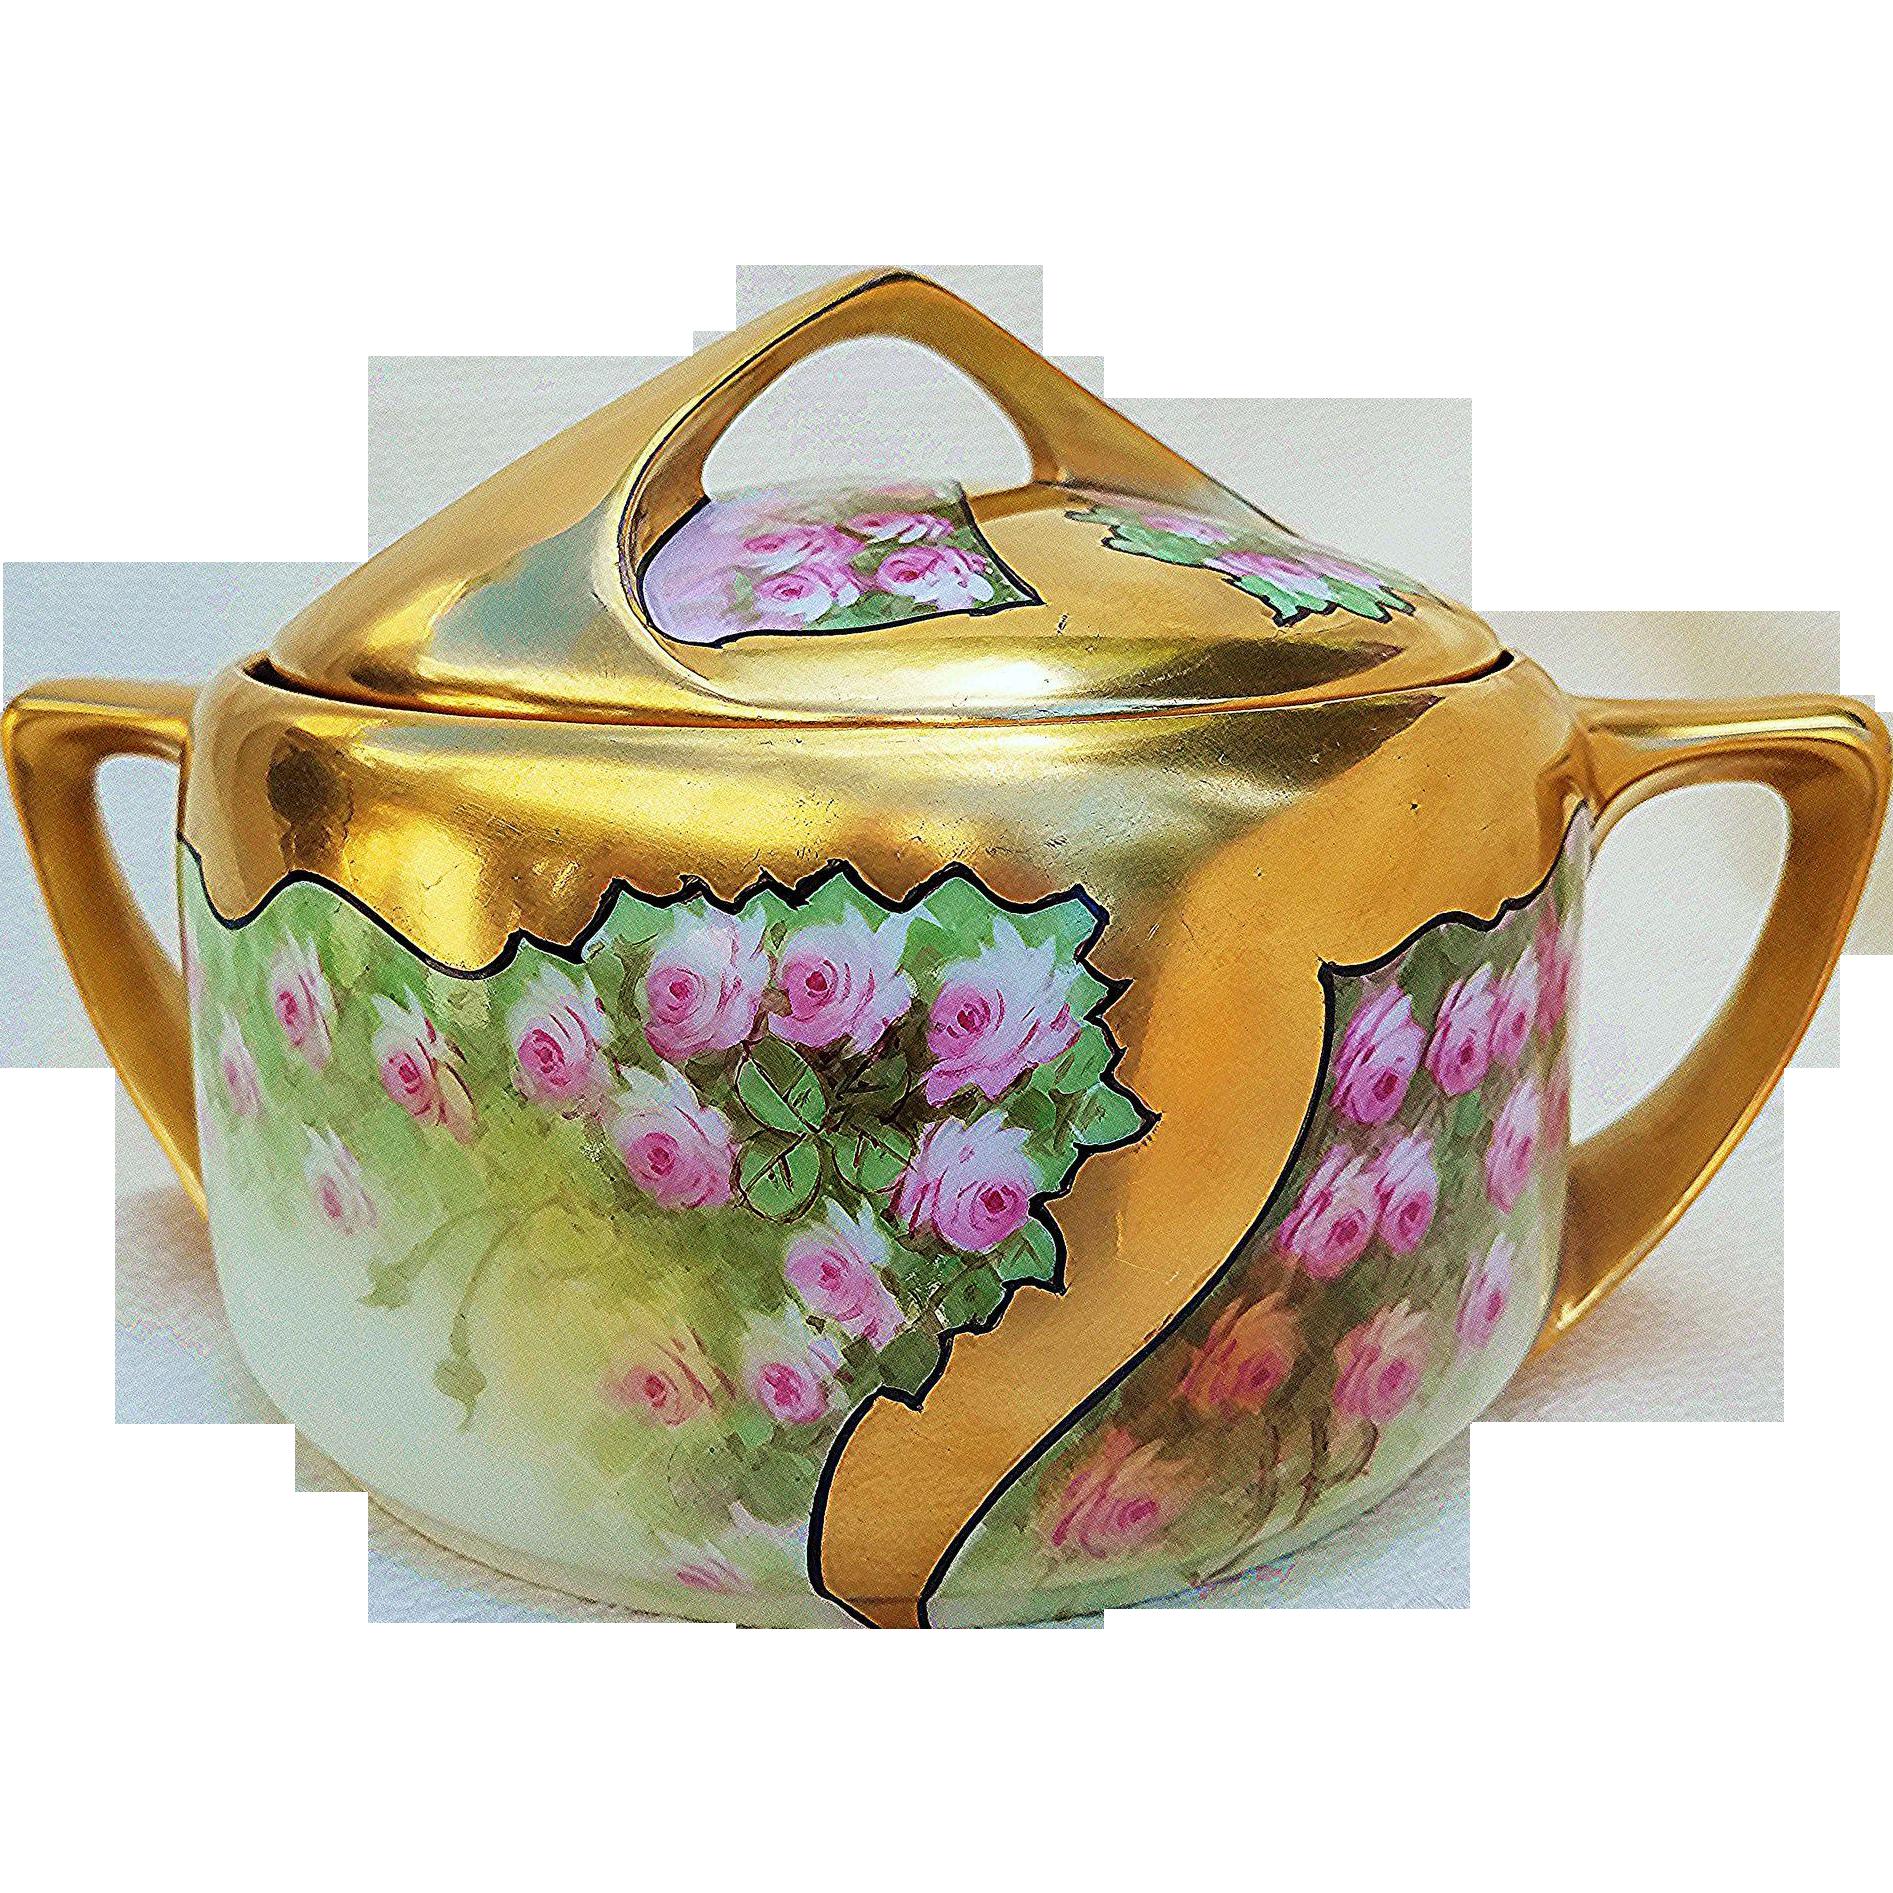 "Spectacular Rosenthal Bavaria & Osborne Studio of Chicago 1914 Hand Painted ""Petite Pink Roses"" Heavy Gilded Gold Floral Cracker Jar by Listed Artist, ""Asbjorn Osborne"""